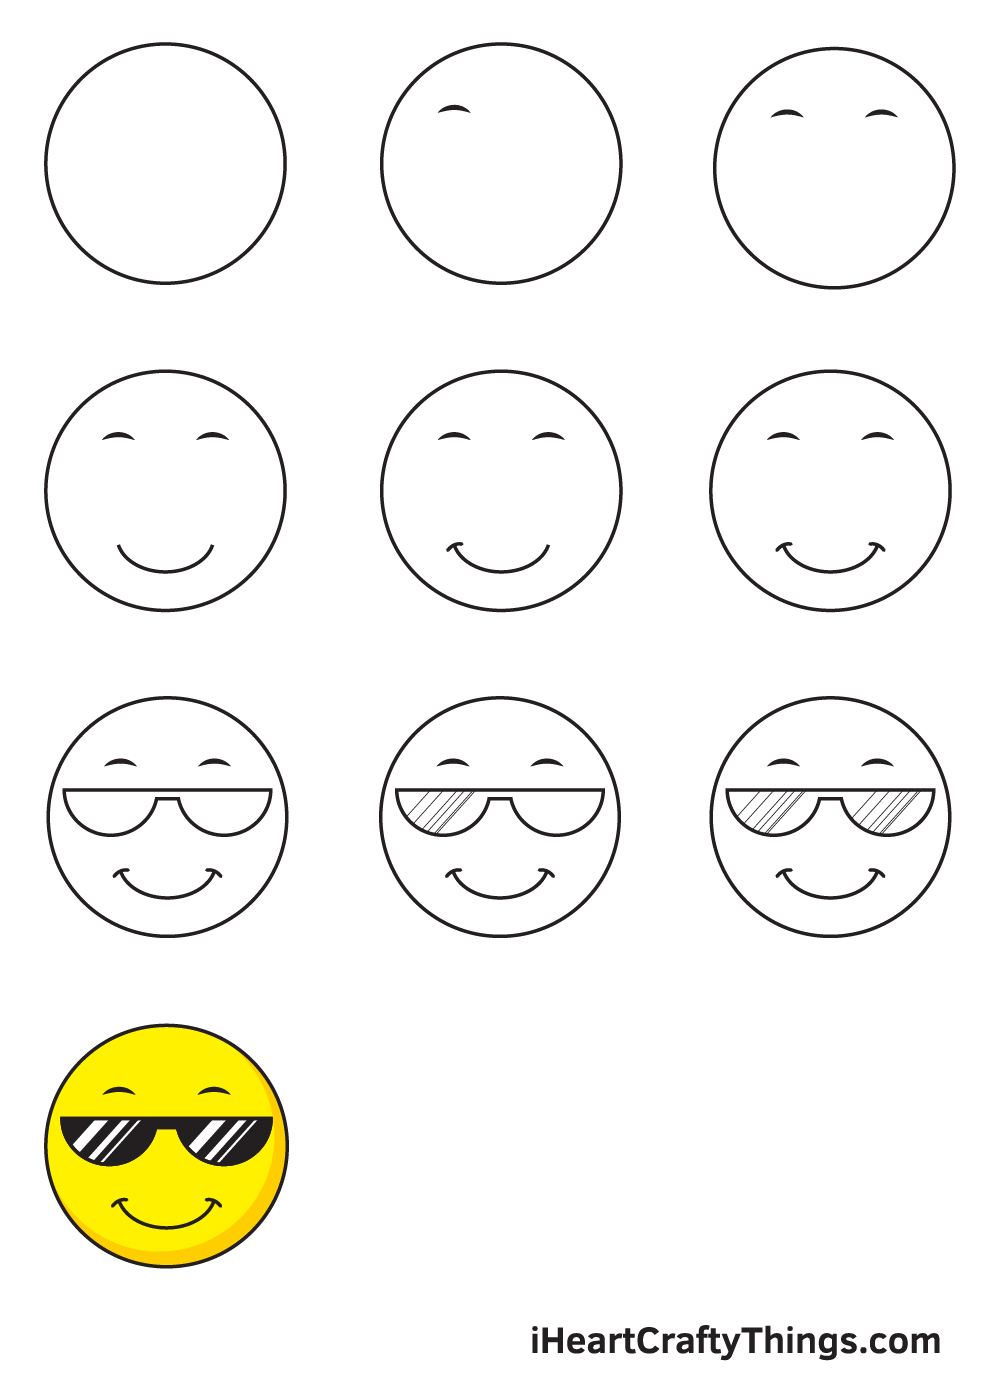 Drawing Cool Things in 9 Easy Steps